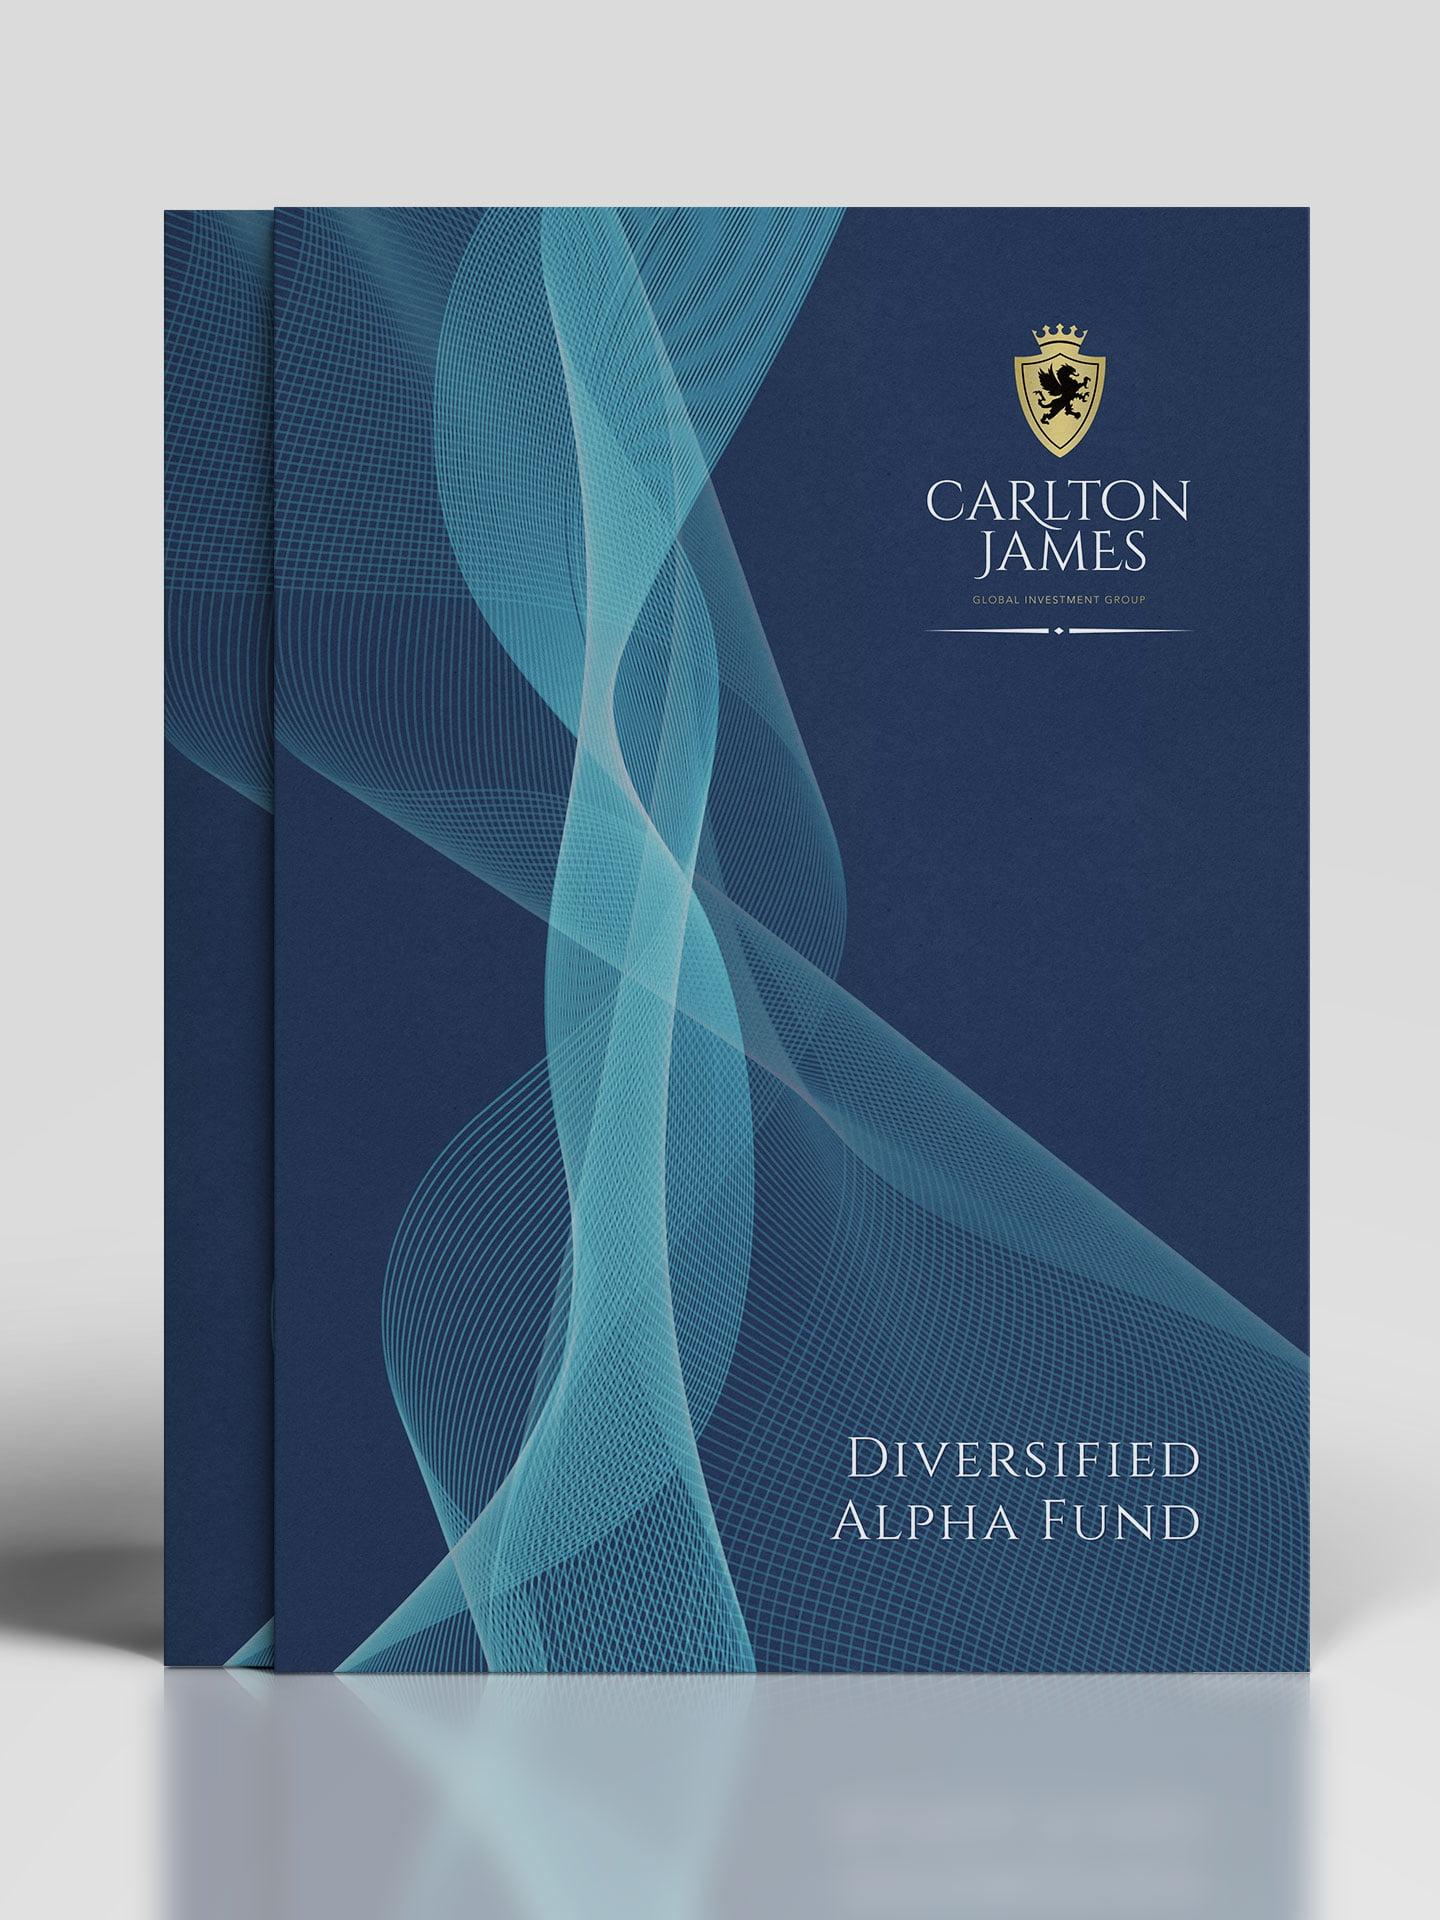 Carlton James - Diversified Alpha Fund